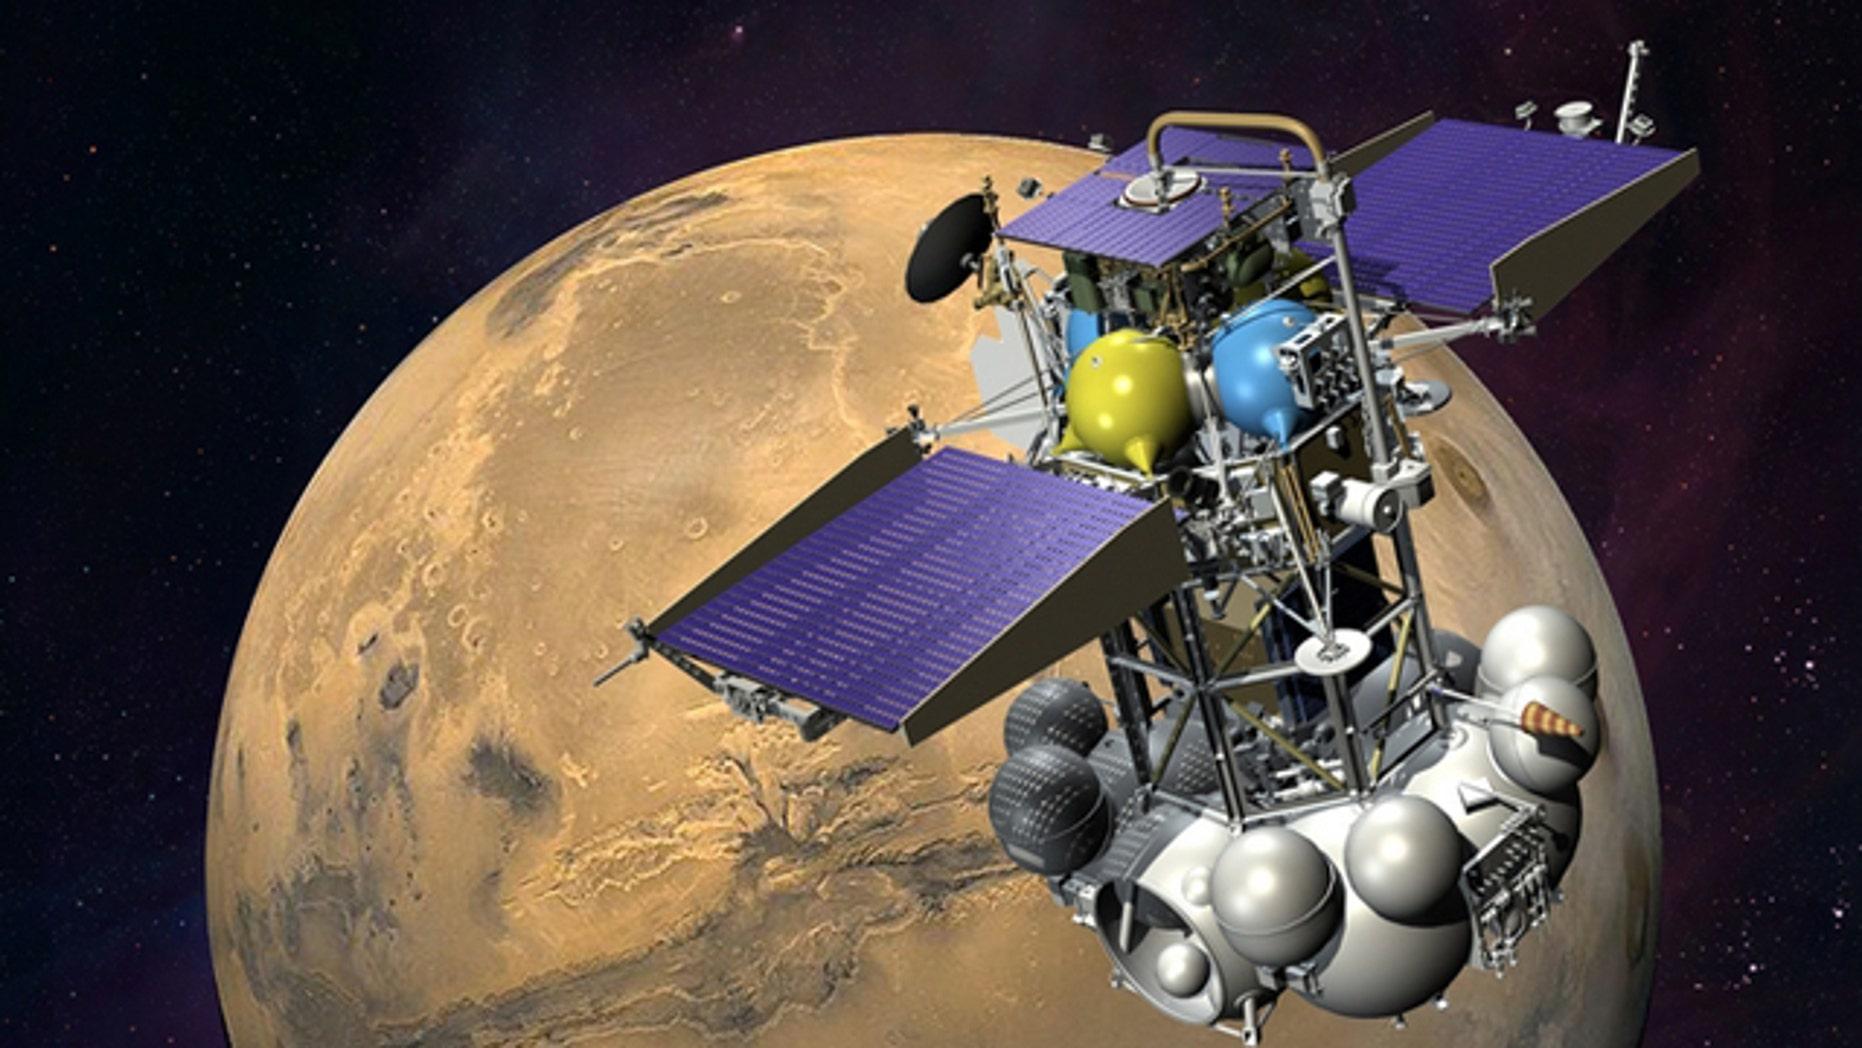 An artist's impression of Phobos-Grunt in Mars orbit.